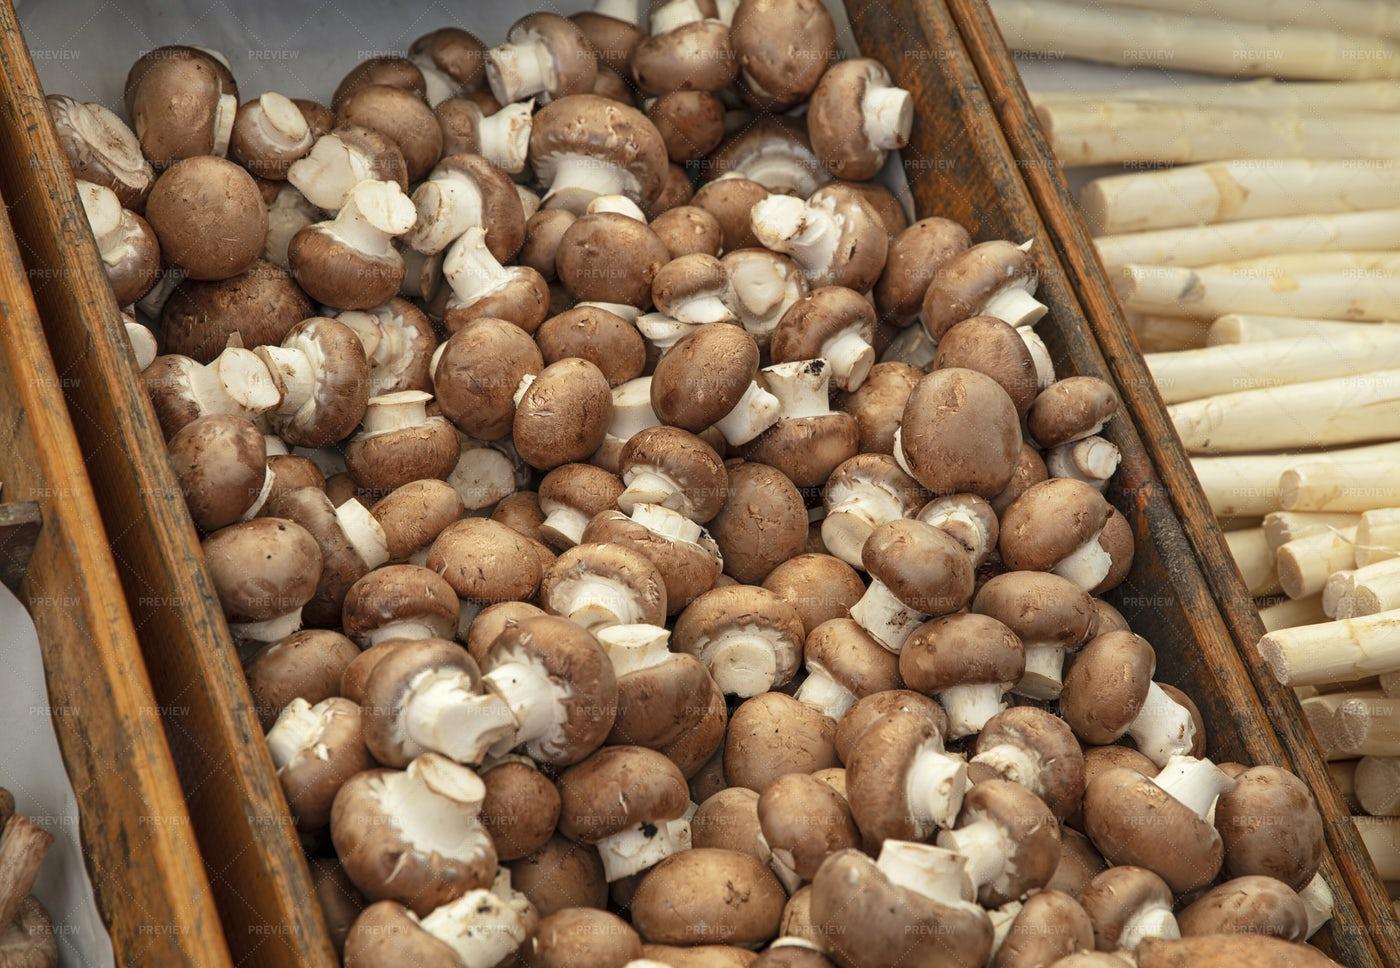 Mushrooms On A Box: Stock Photos